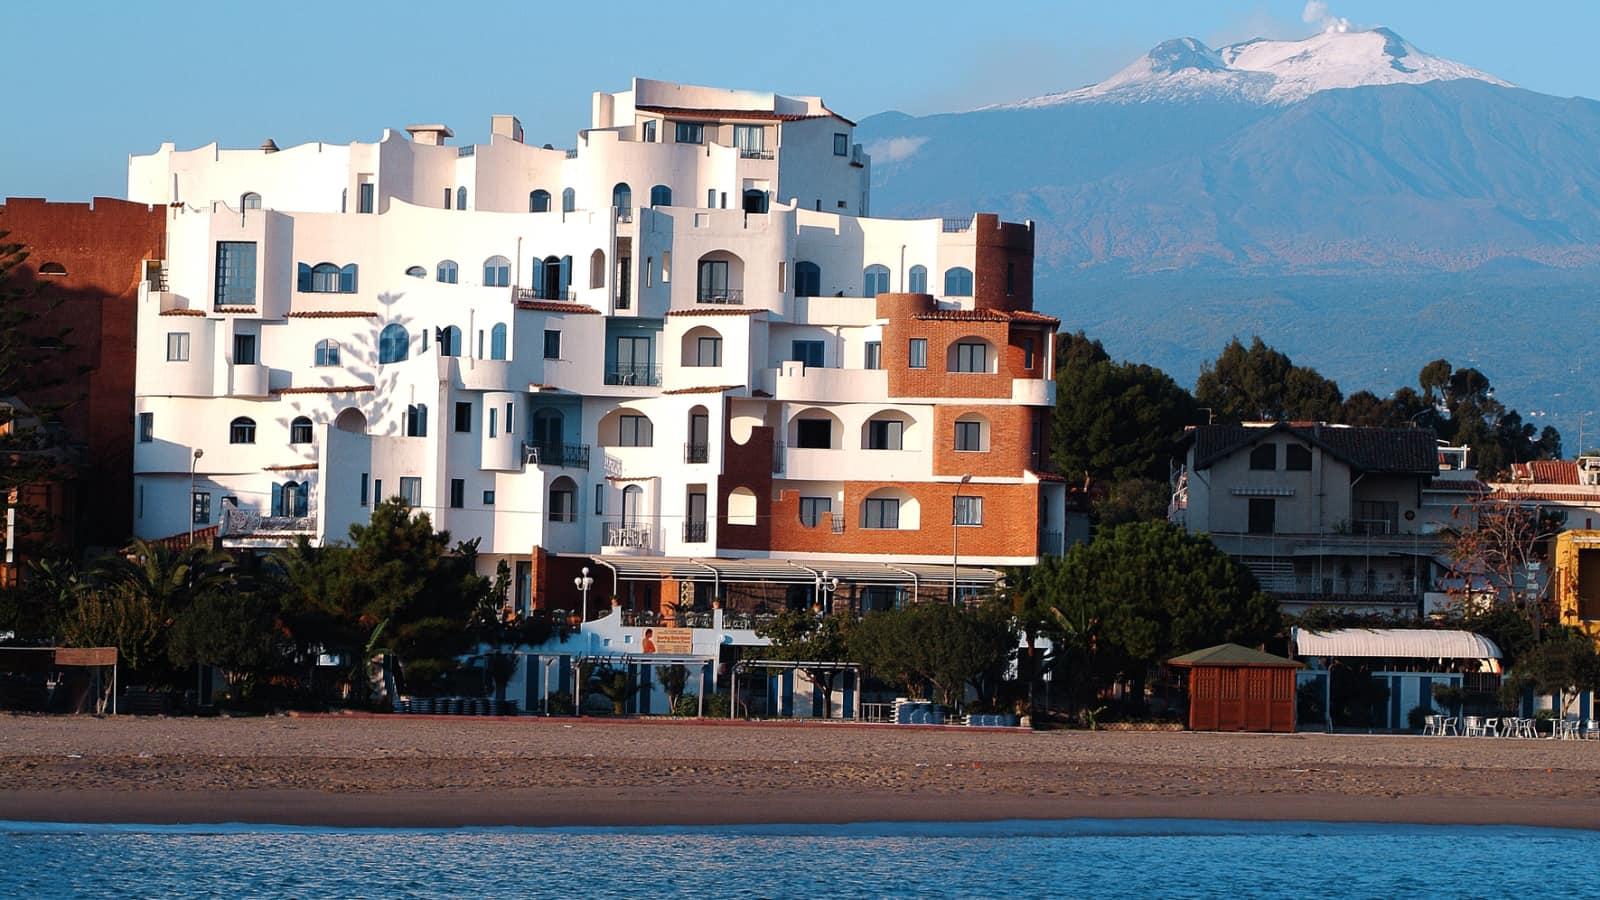 Hotel sporting baia giardini naxos - Hotel ai giardini naxos ...